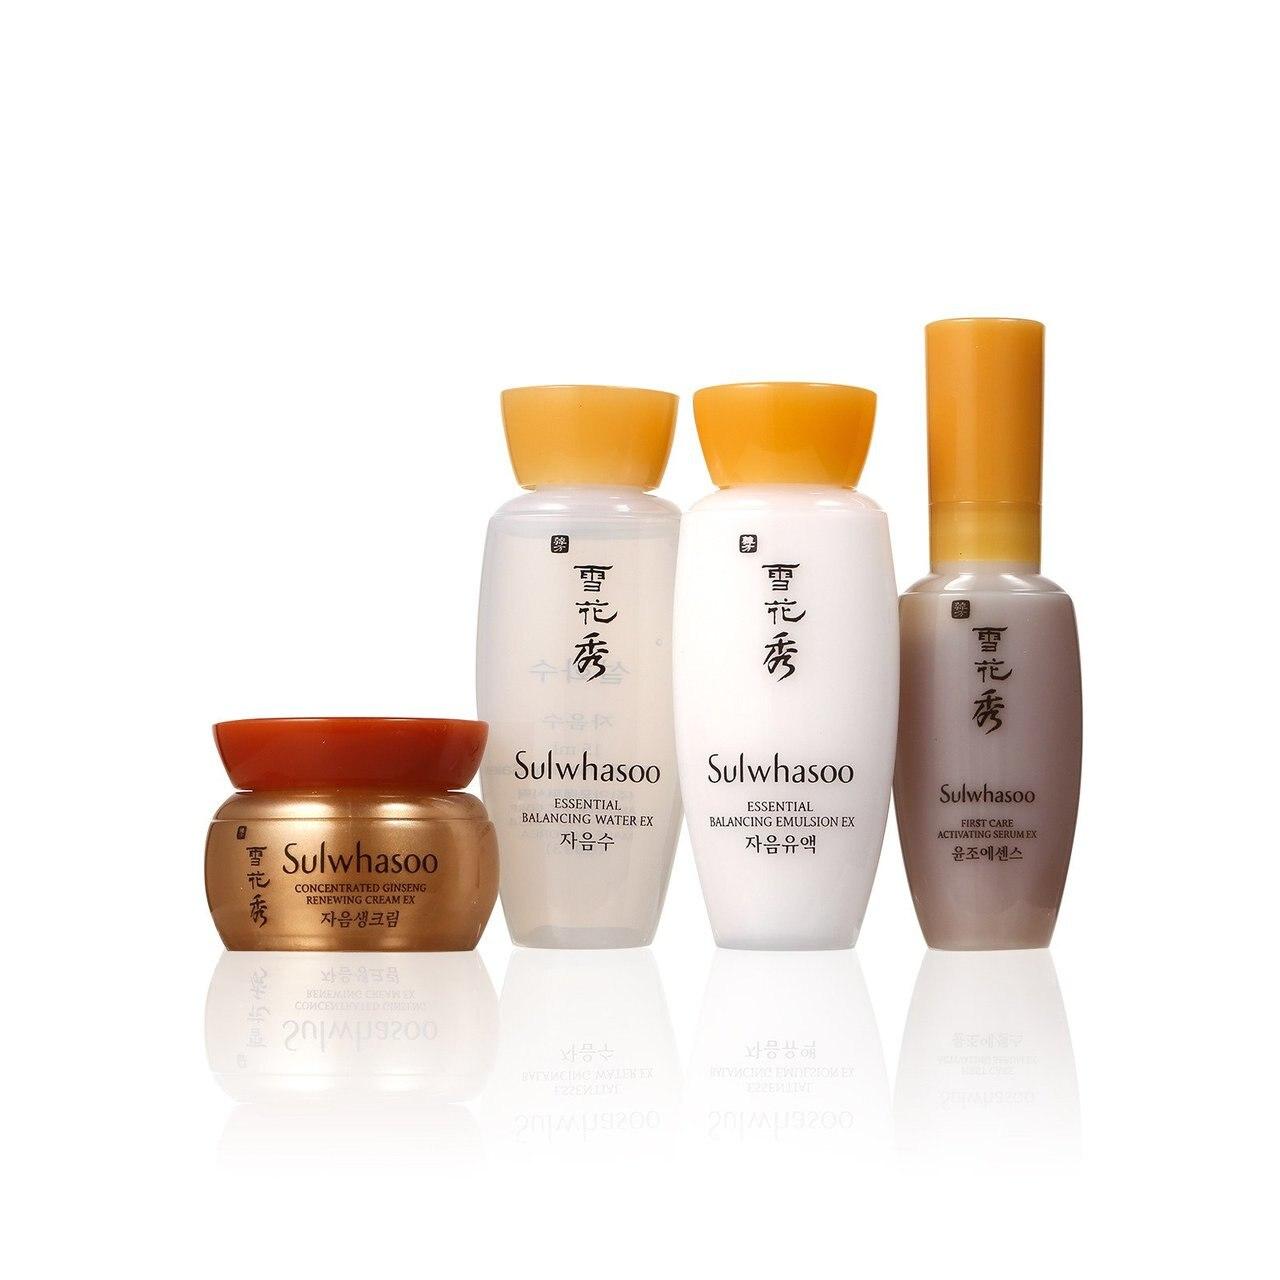 Sulwhasoo First Care Set (4 items)